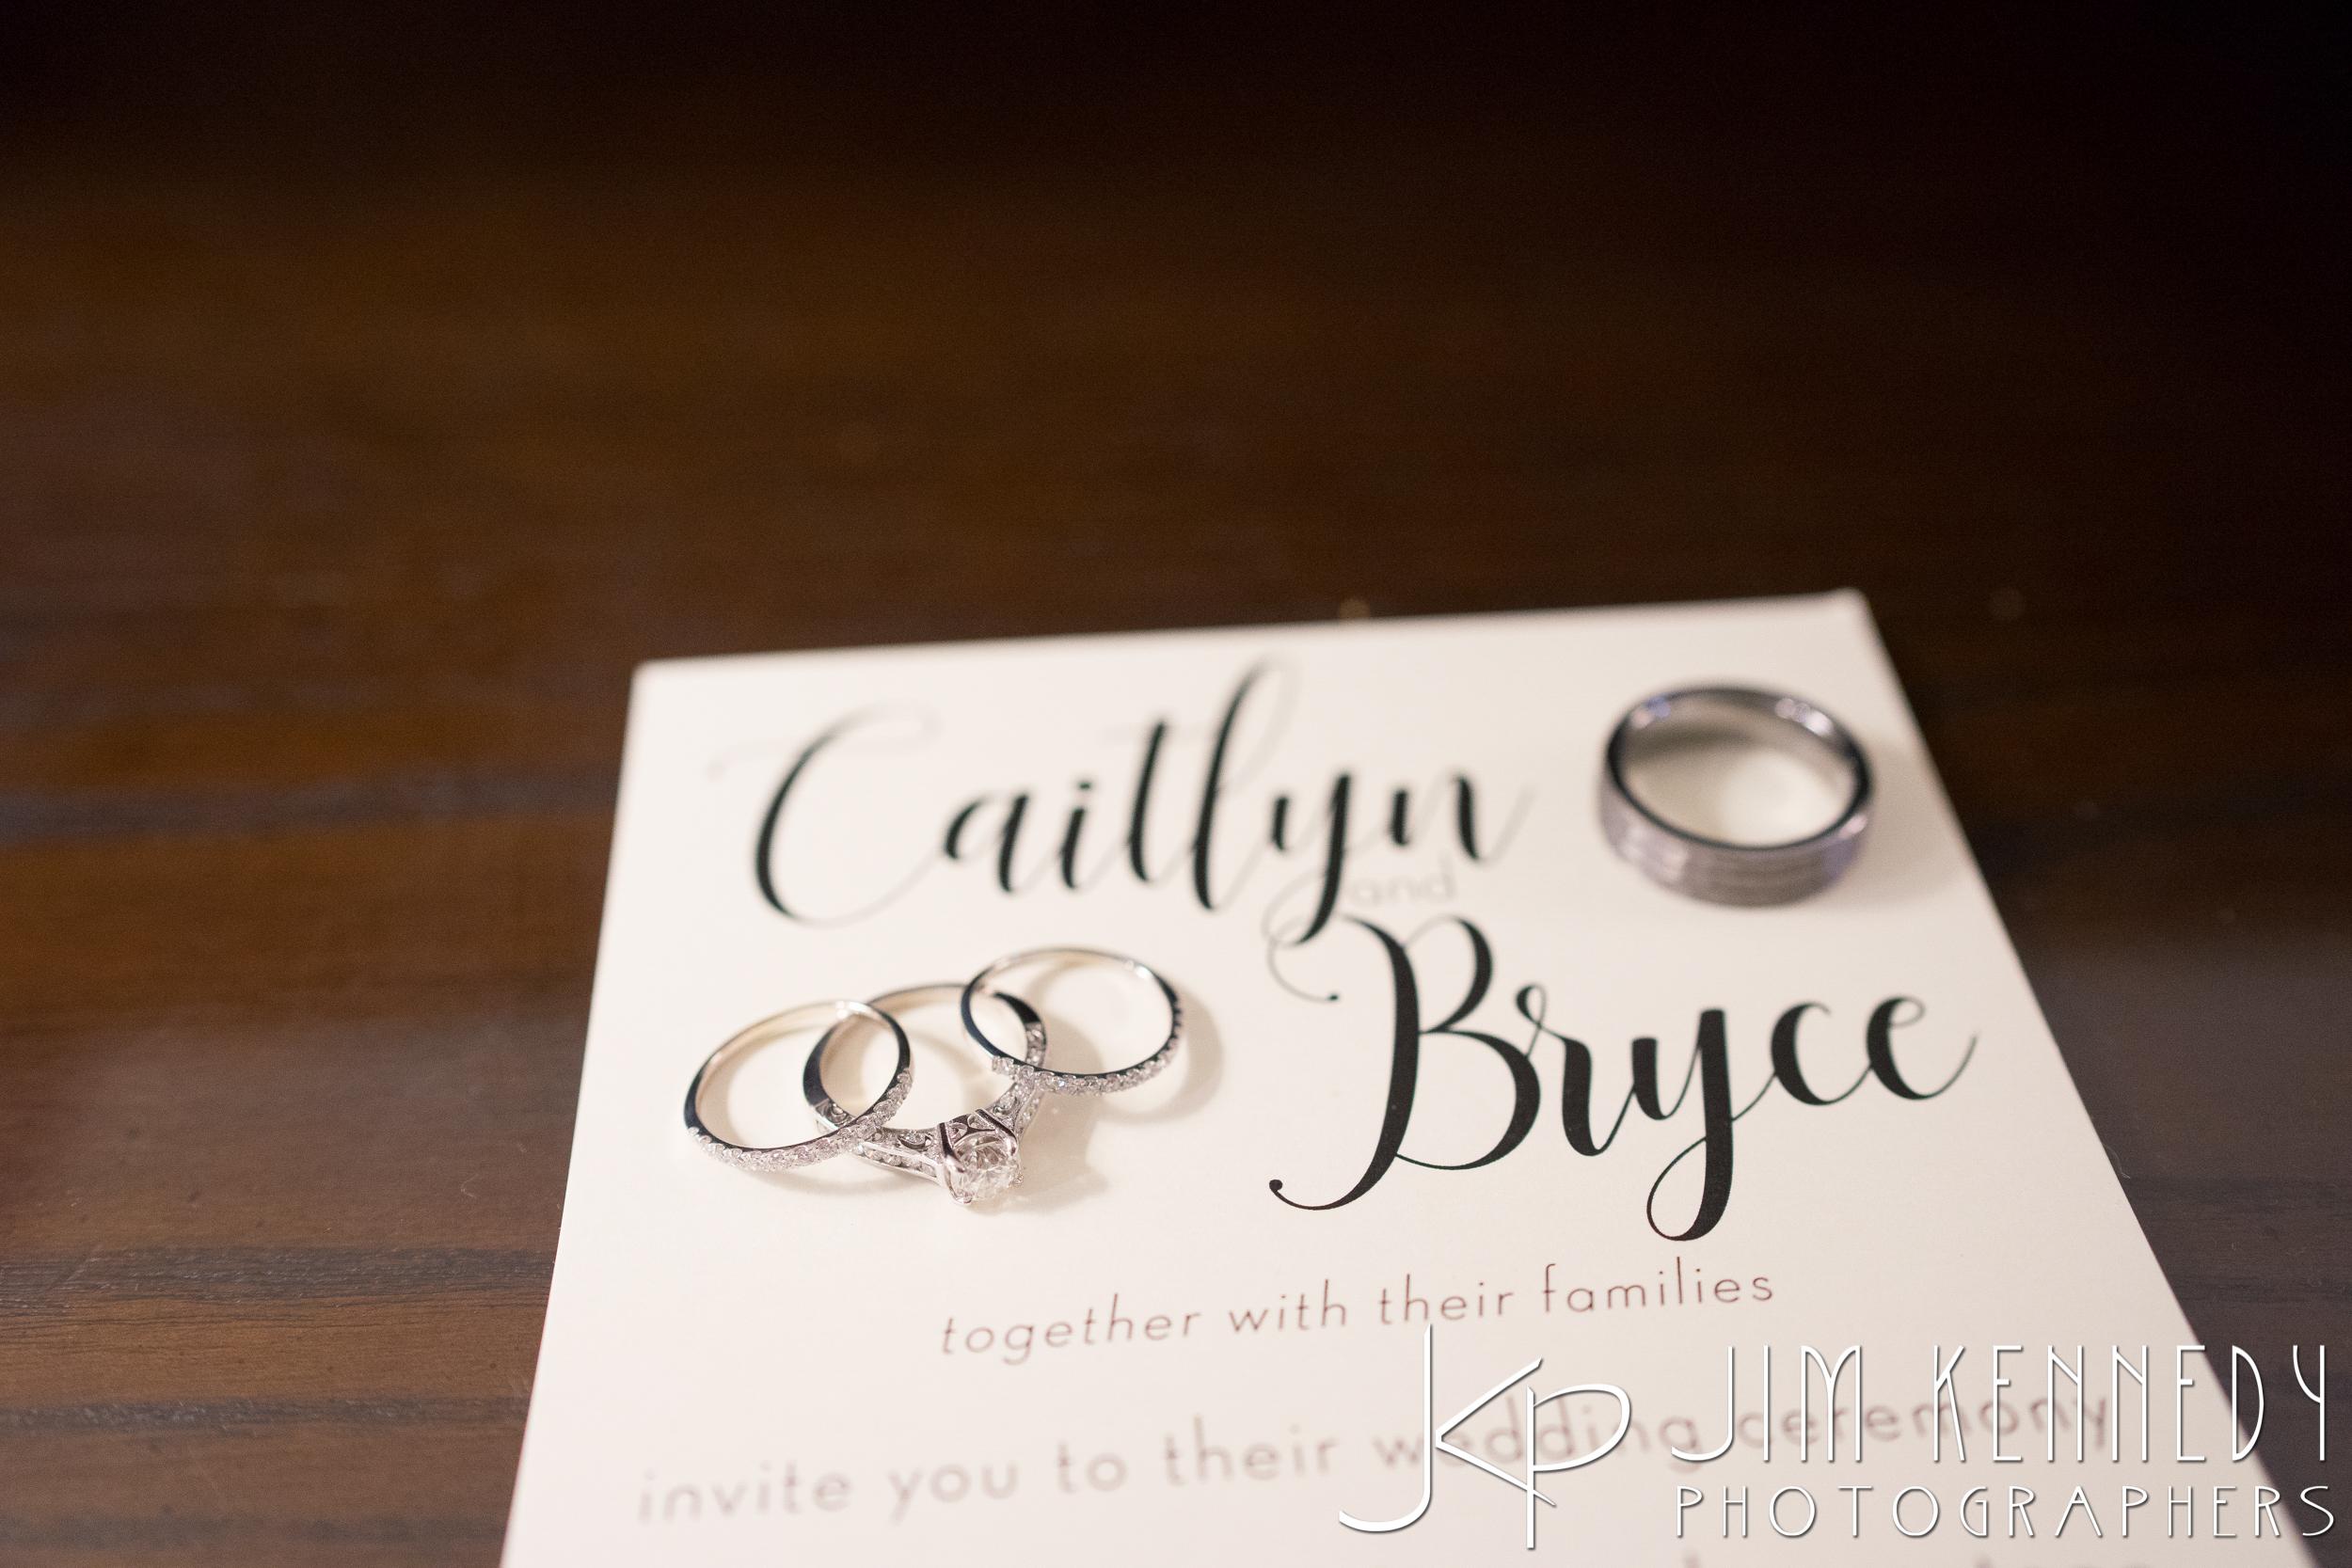 jim_kennedy_photographers_highland_springs_wedding_caitlyn_0001.jpg